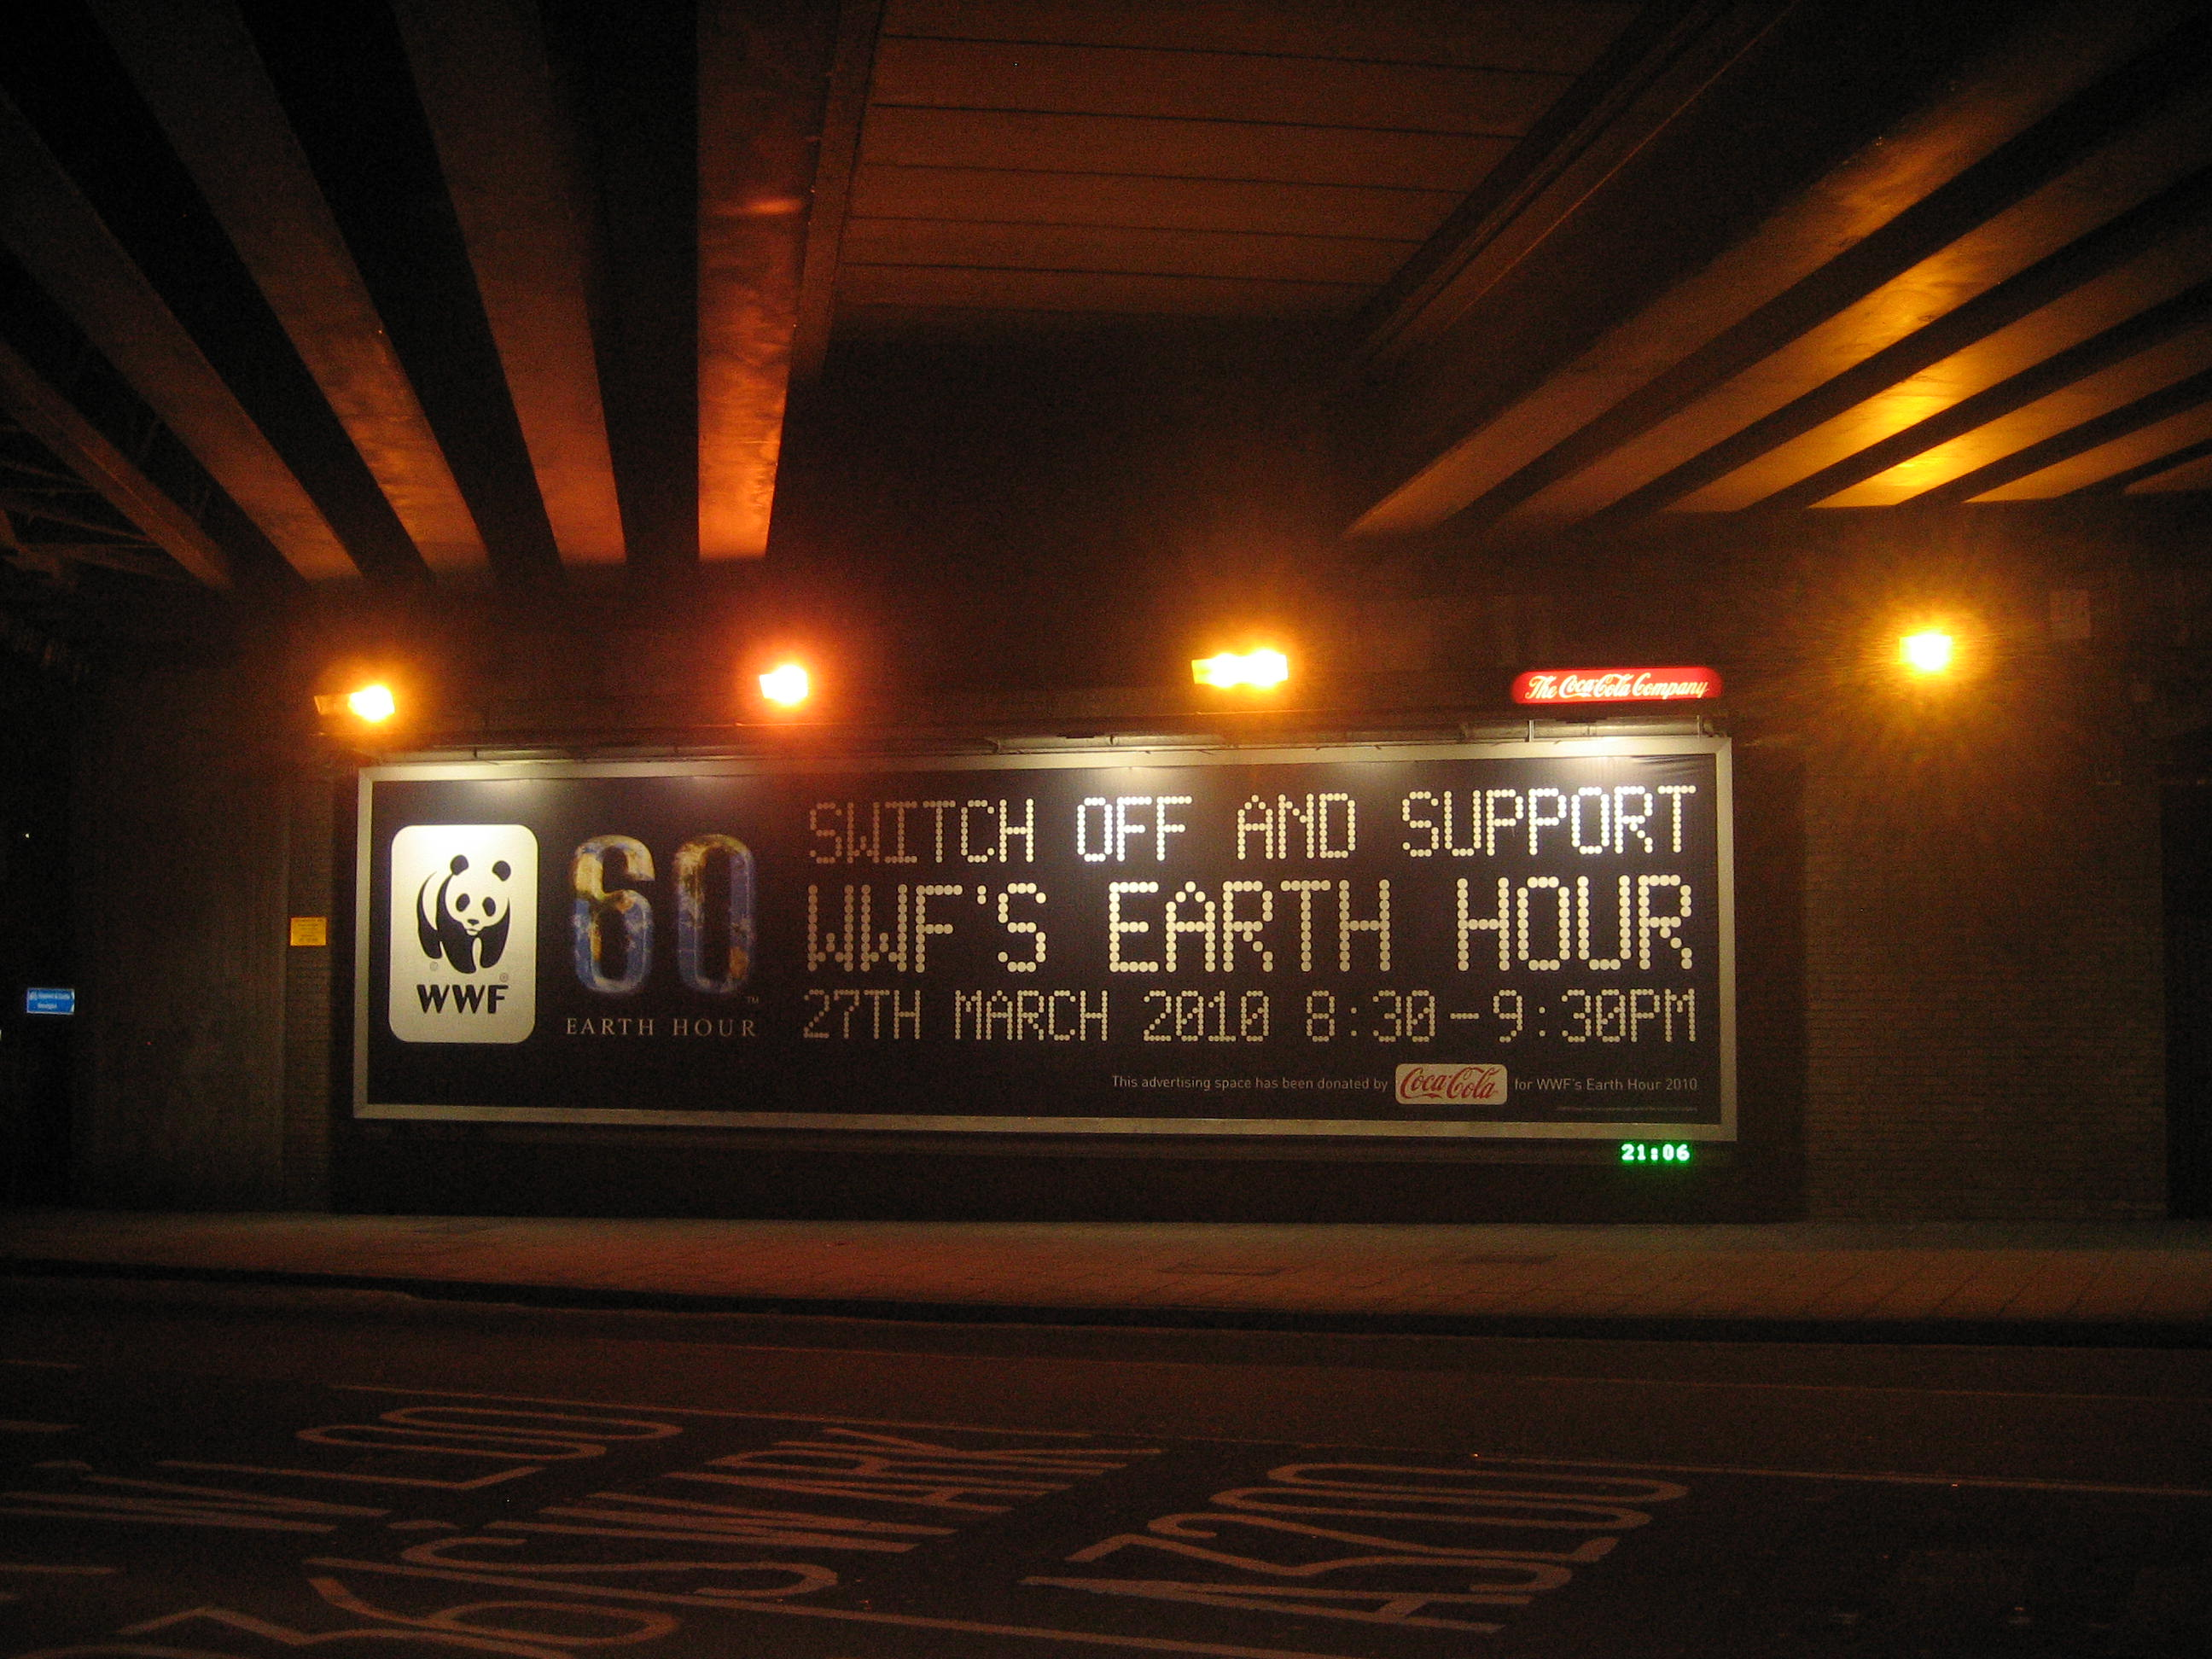 WWF Earth Hour FAIL